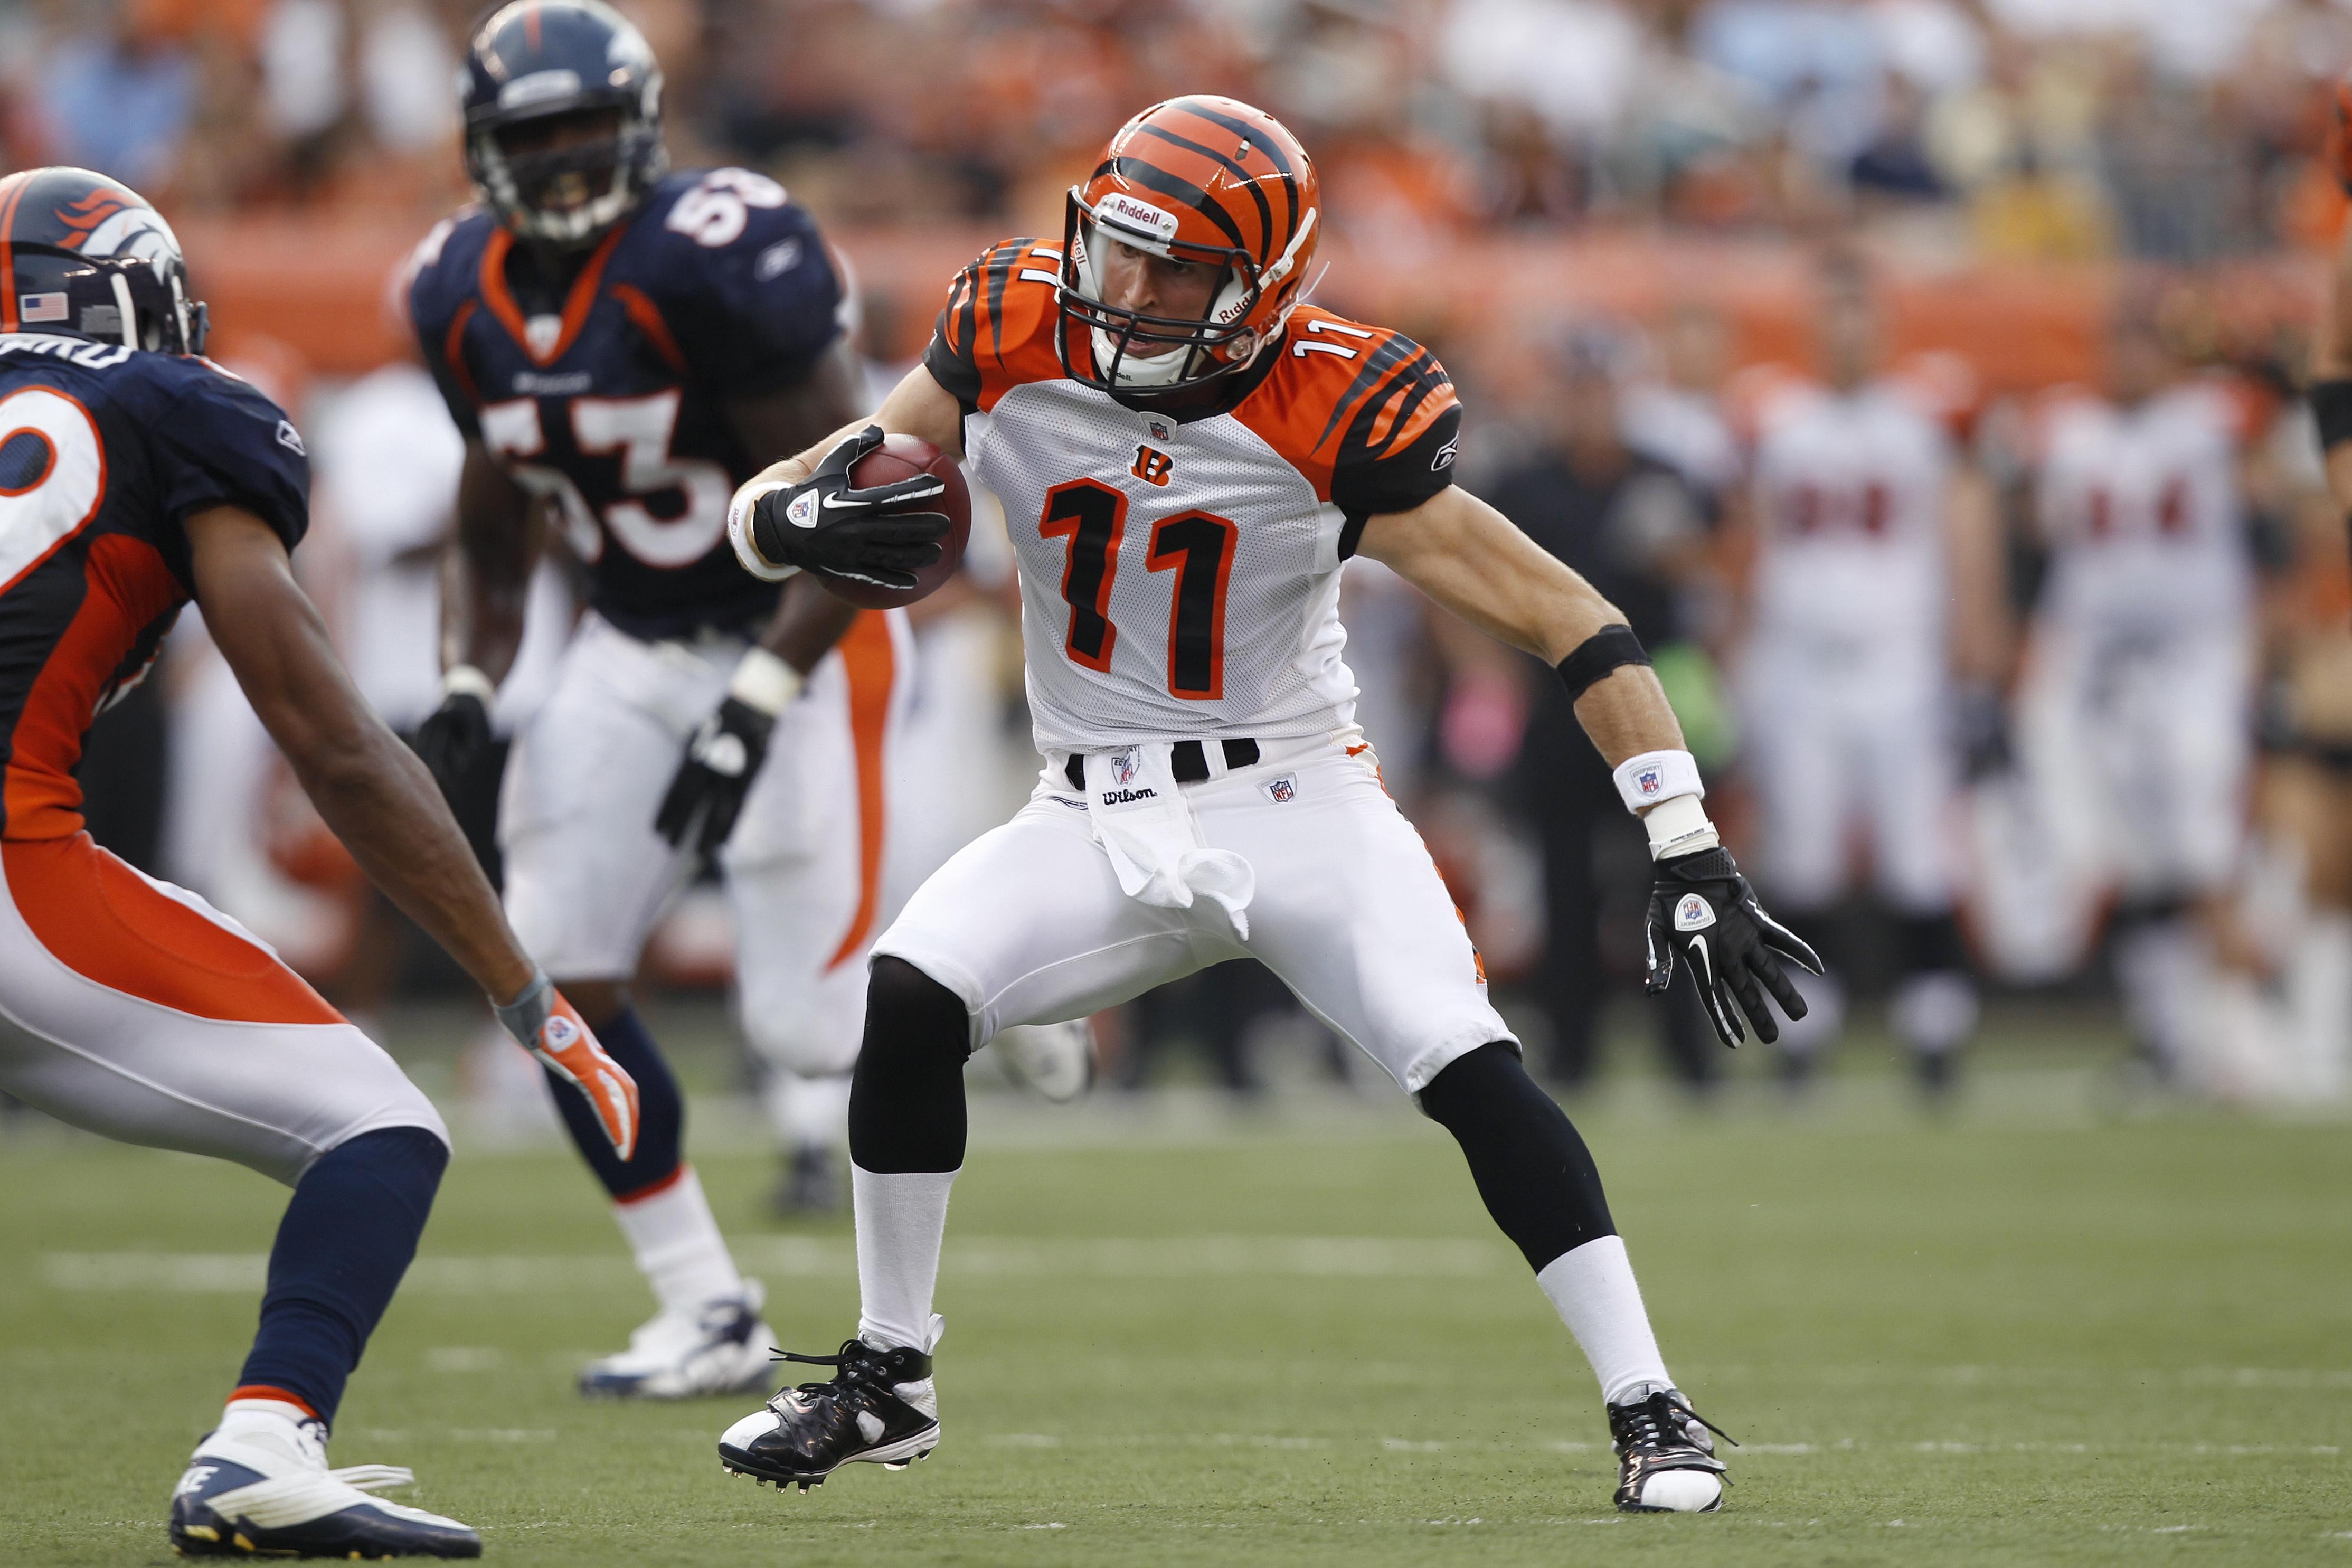 Cincinnati wide receiver Jordan Shipley